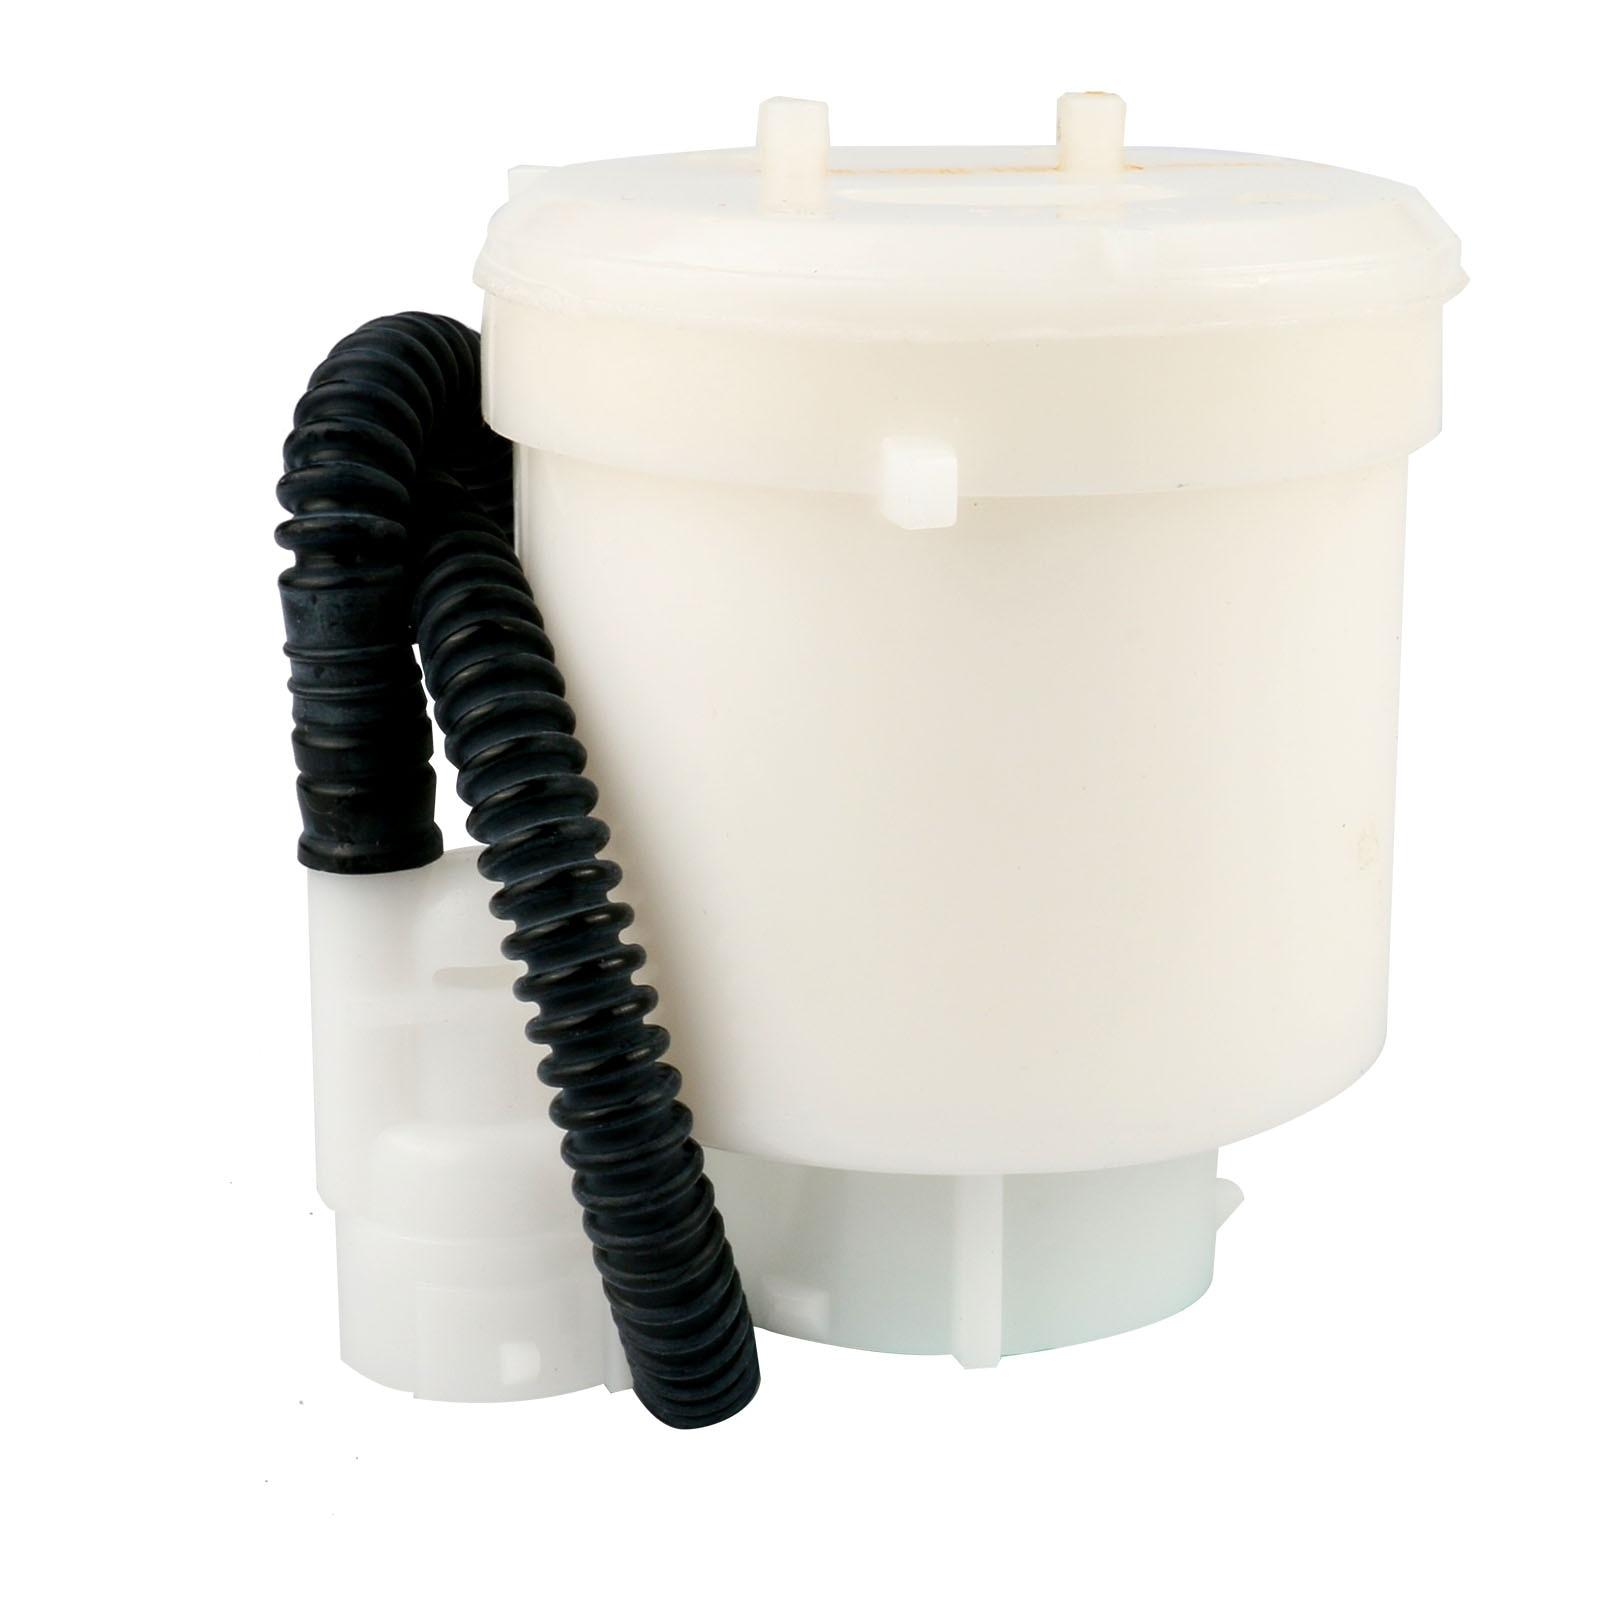 Car Gas Gasoline Petrol Fuel Filter Oe 77024 0d070 Replacement Parts 2008 Rav4 1car